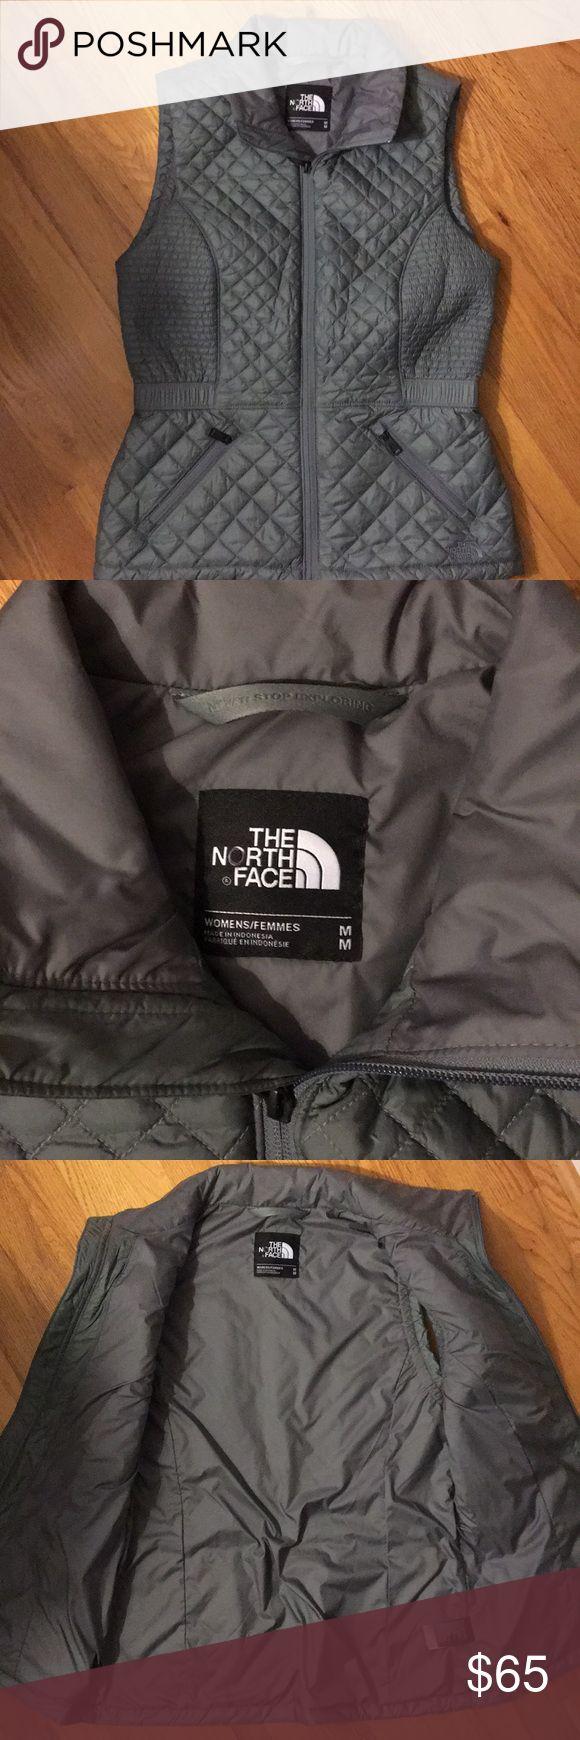 THE NORTH FACE GRAY VEST The North Face gray vest size medium. Gray quilt d vest with elastic waist. Two front zip pockets. EUC. The North Face Jackets & Coats Vests